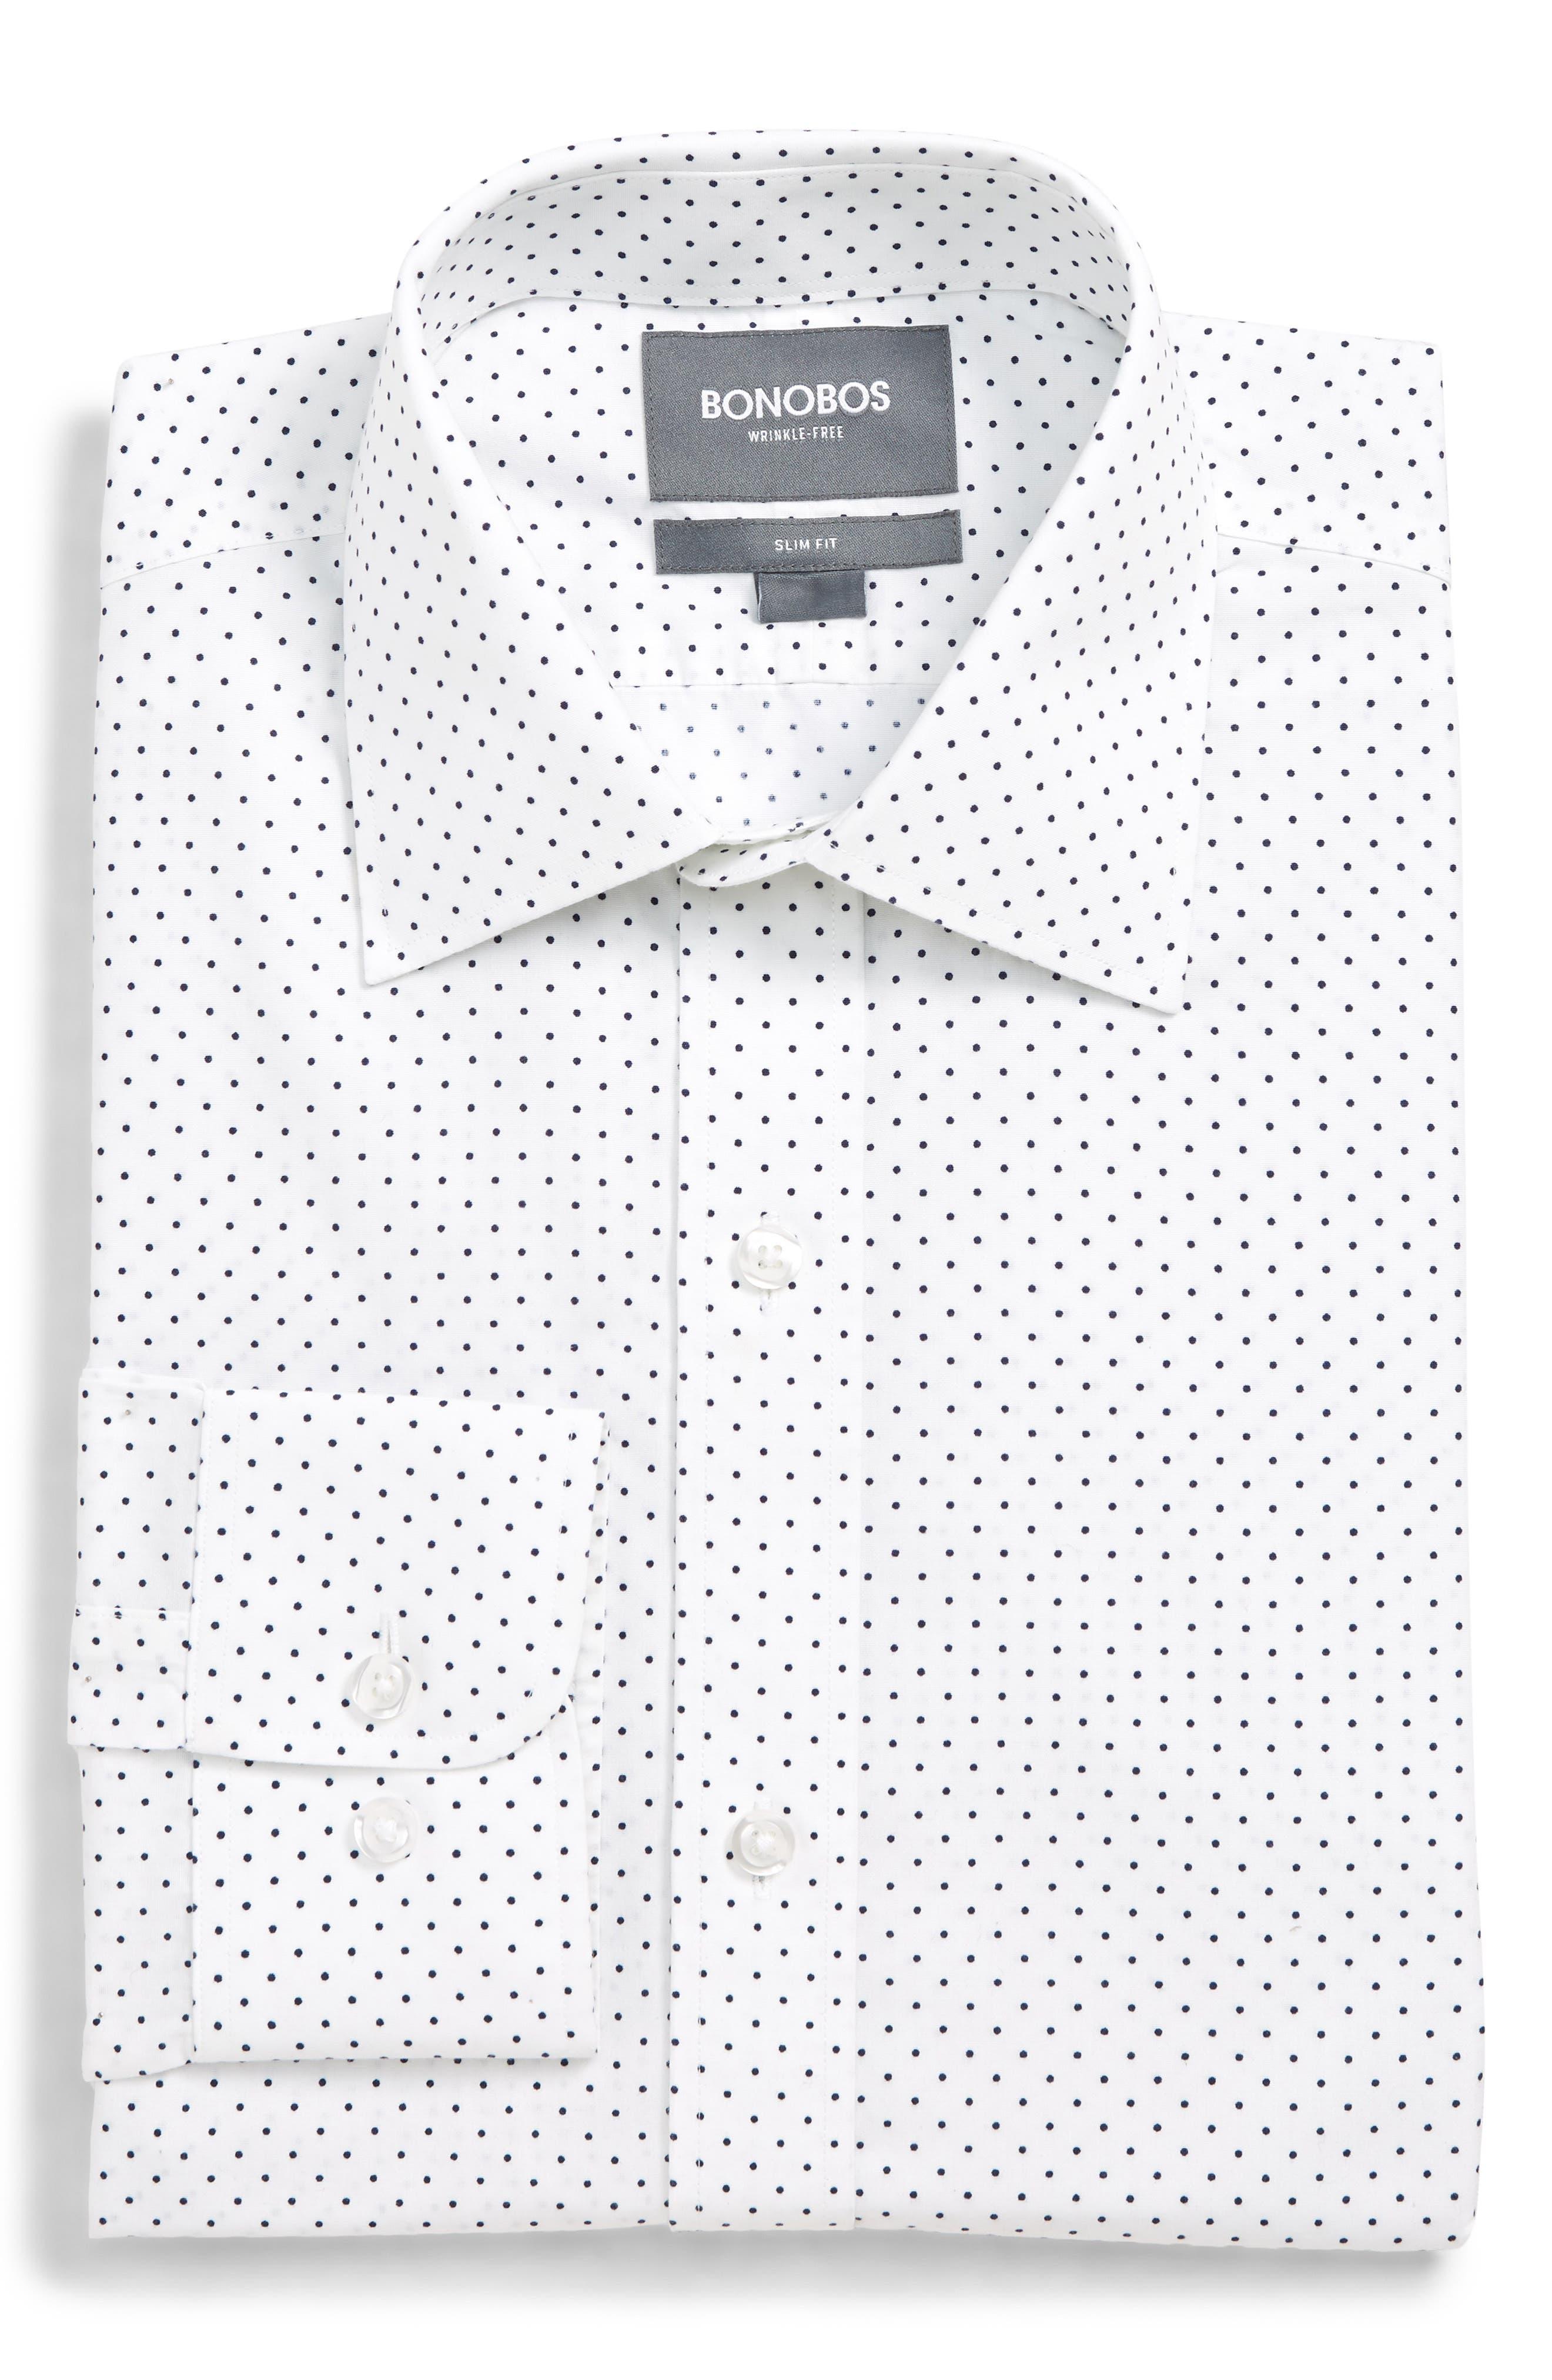 Image of Bonobos Pin Dot Print Trim Fit Dress Shirt